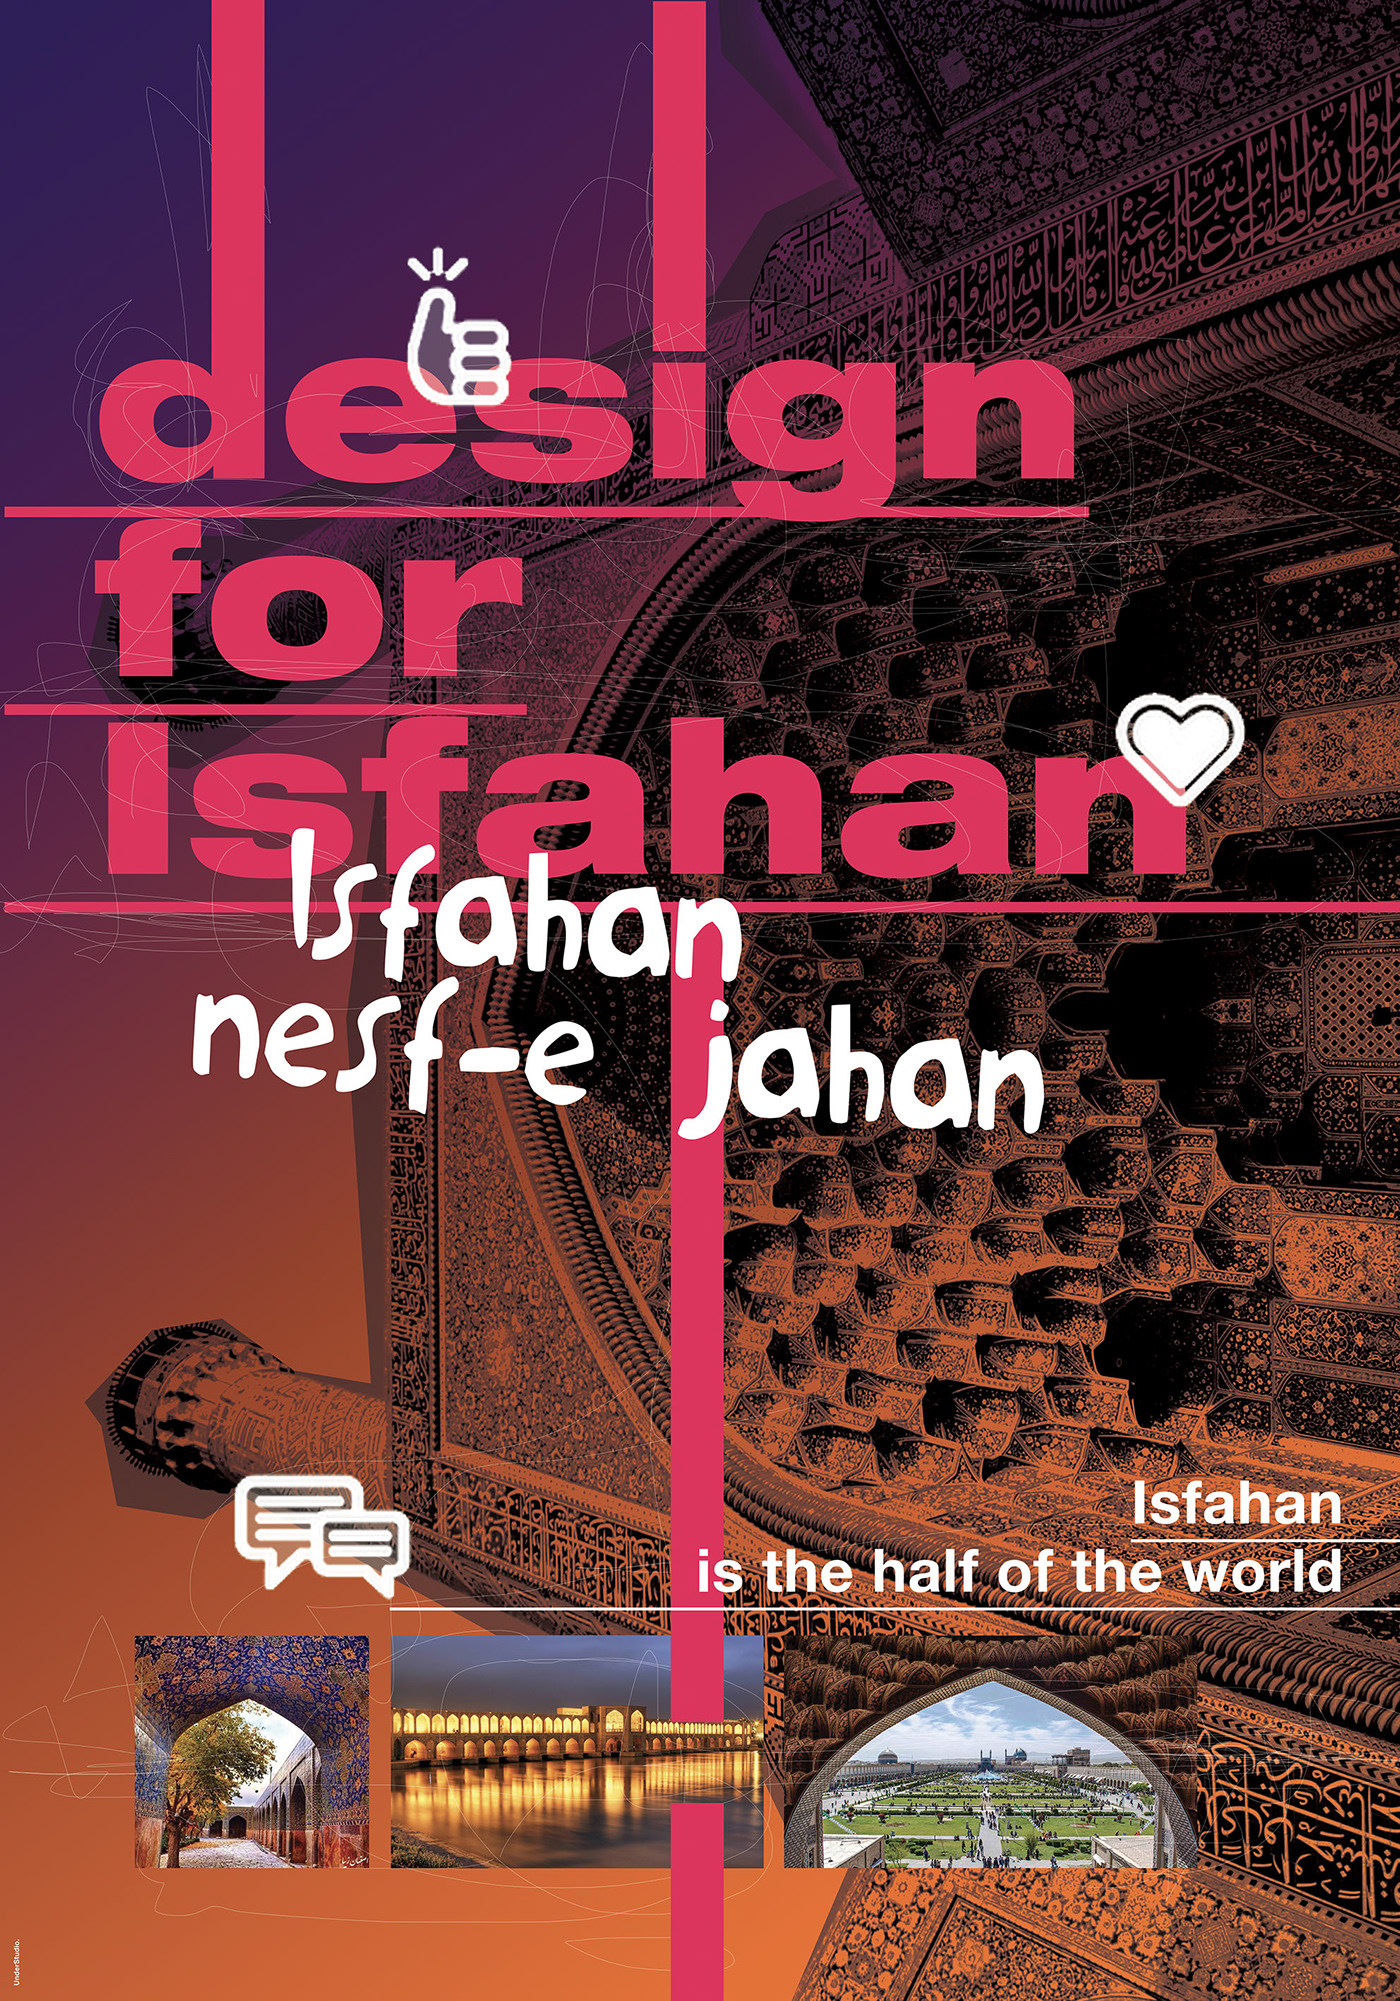 Image may contain: poster, book and screenshot